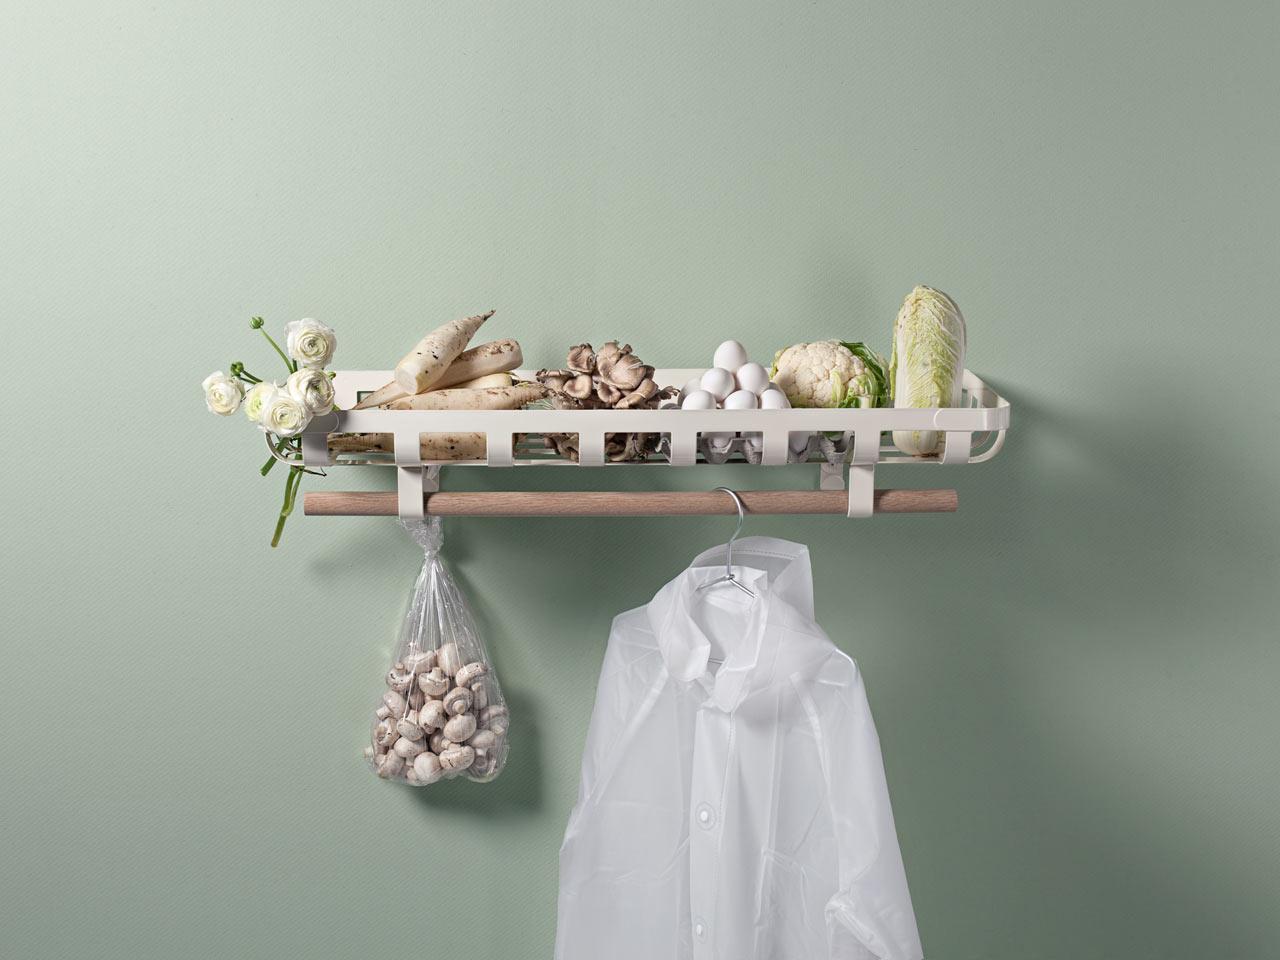 Minus Tio Plans to Keep Your Hallway Organized